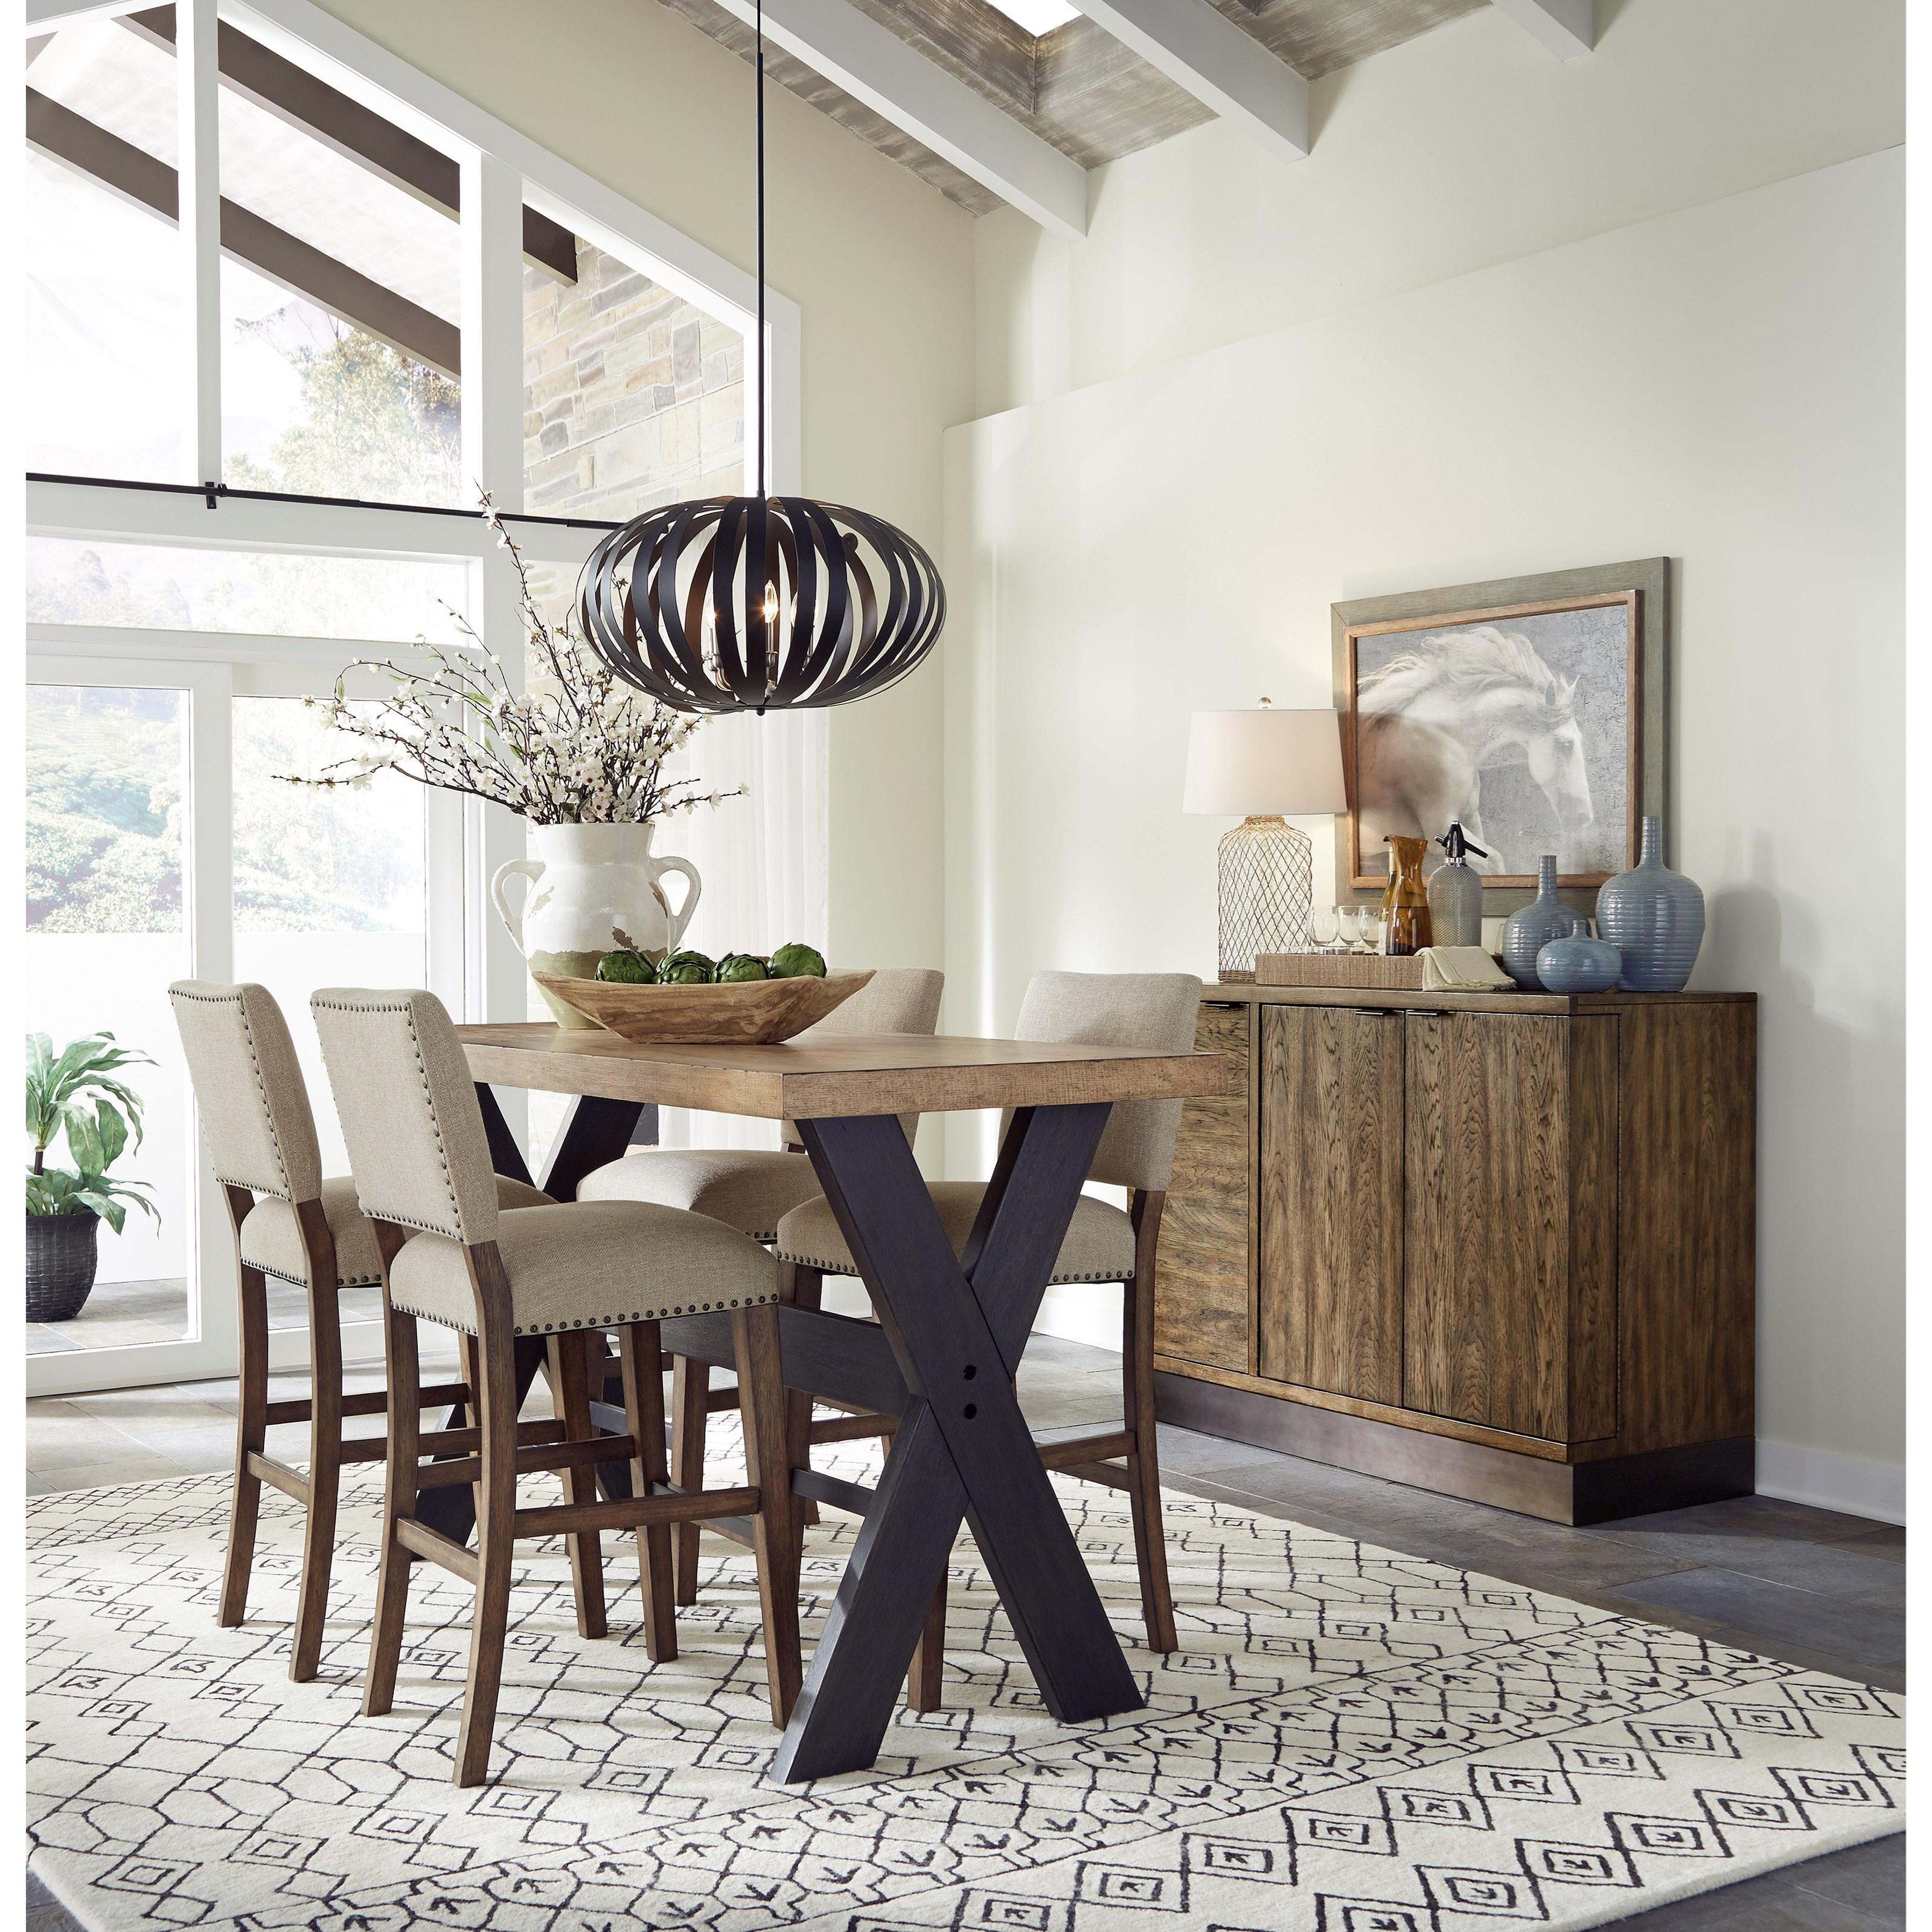 Pulaski Dining Room: Pulaski Furniture The Art Of Dining Casual Dining Room